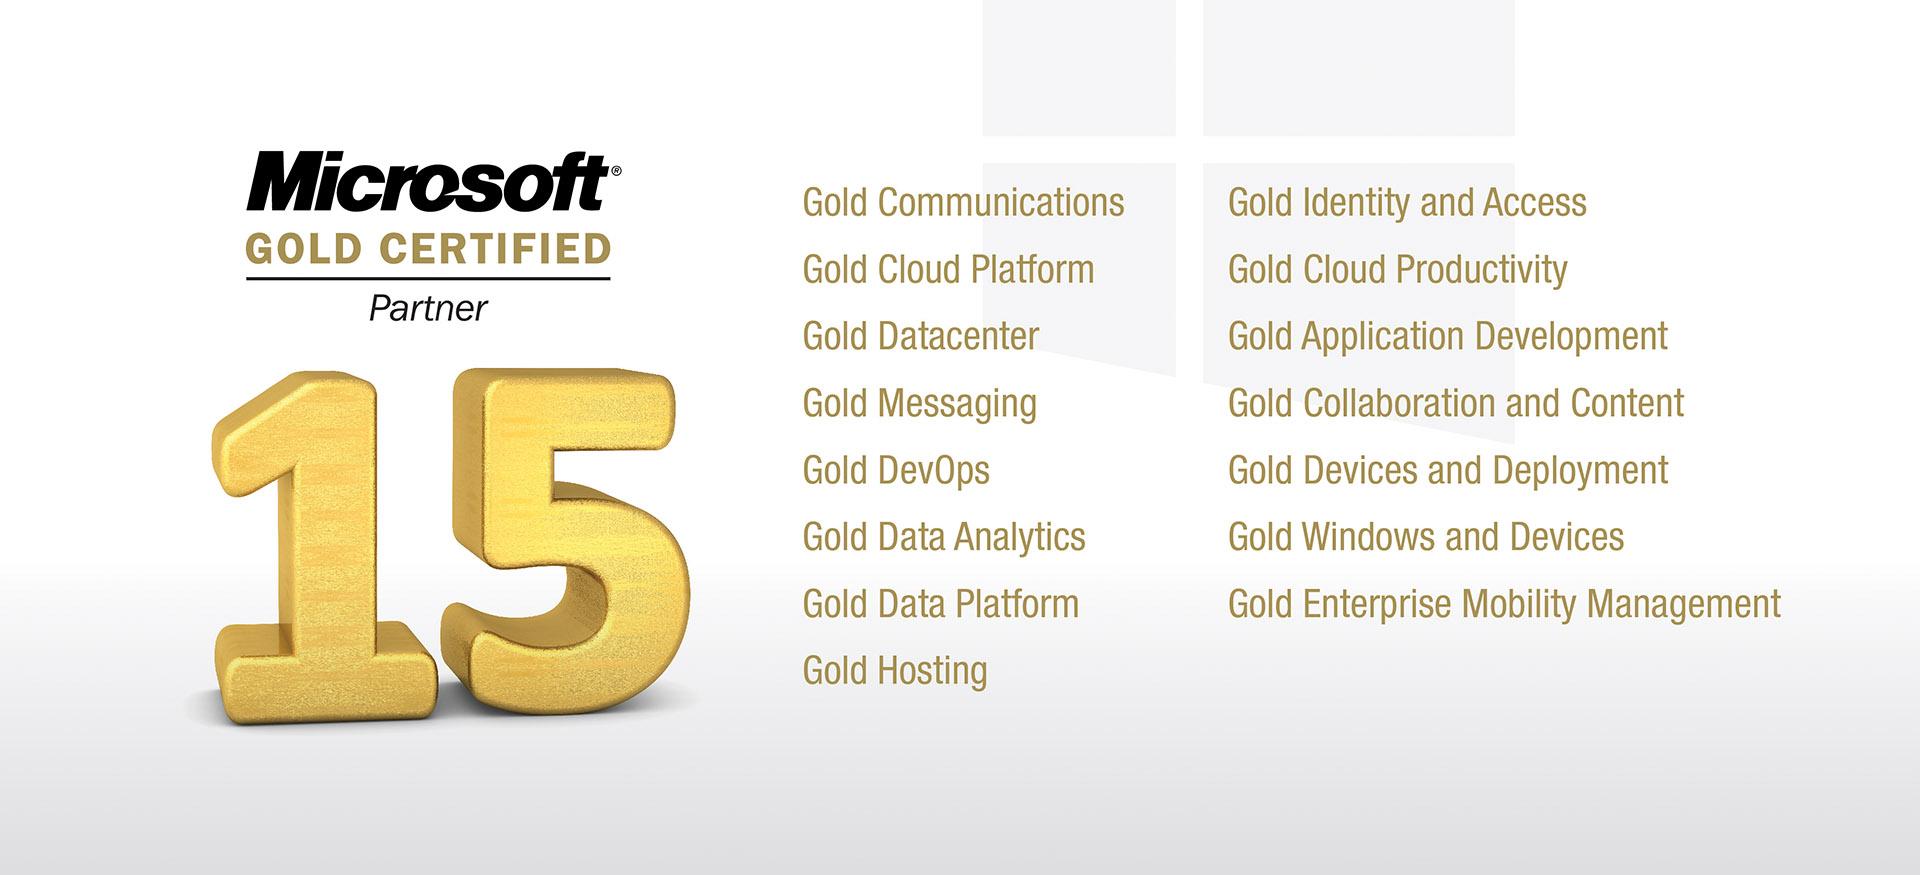 KiZAN Gold Competencies for Microsoft